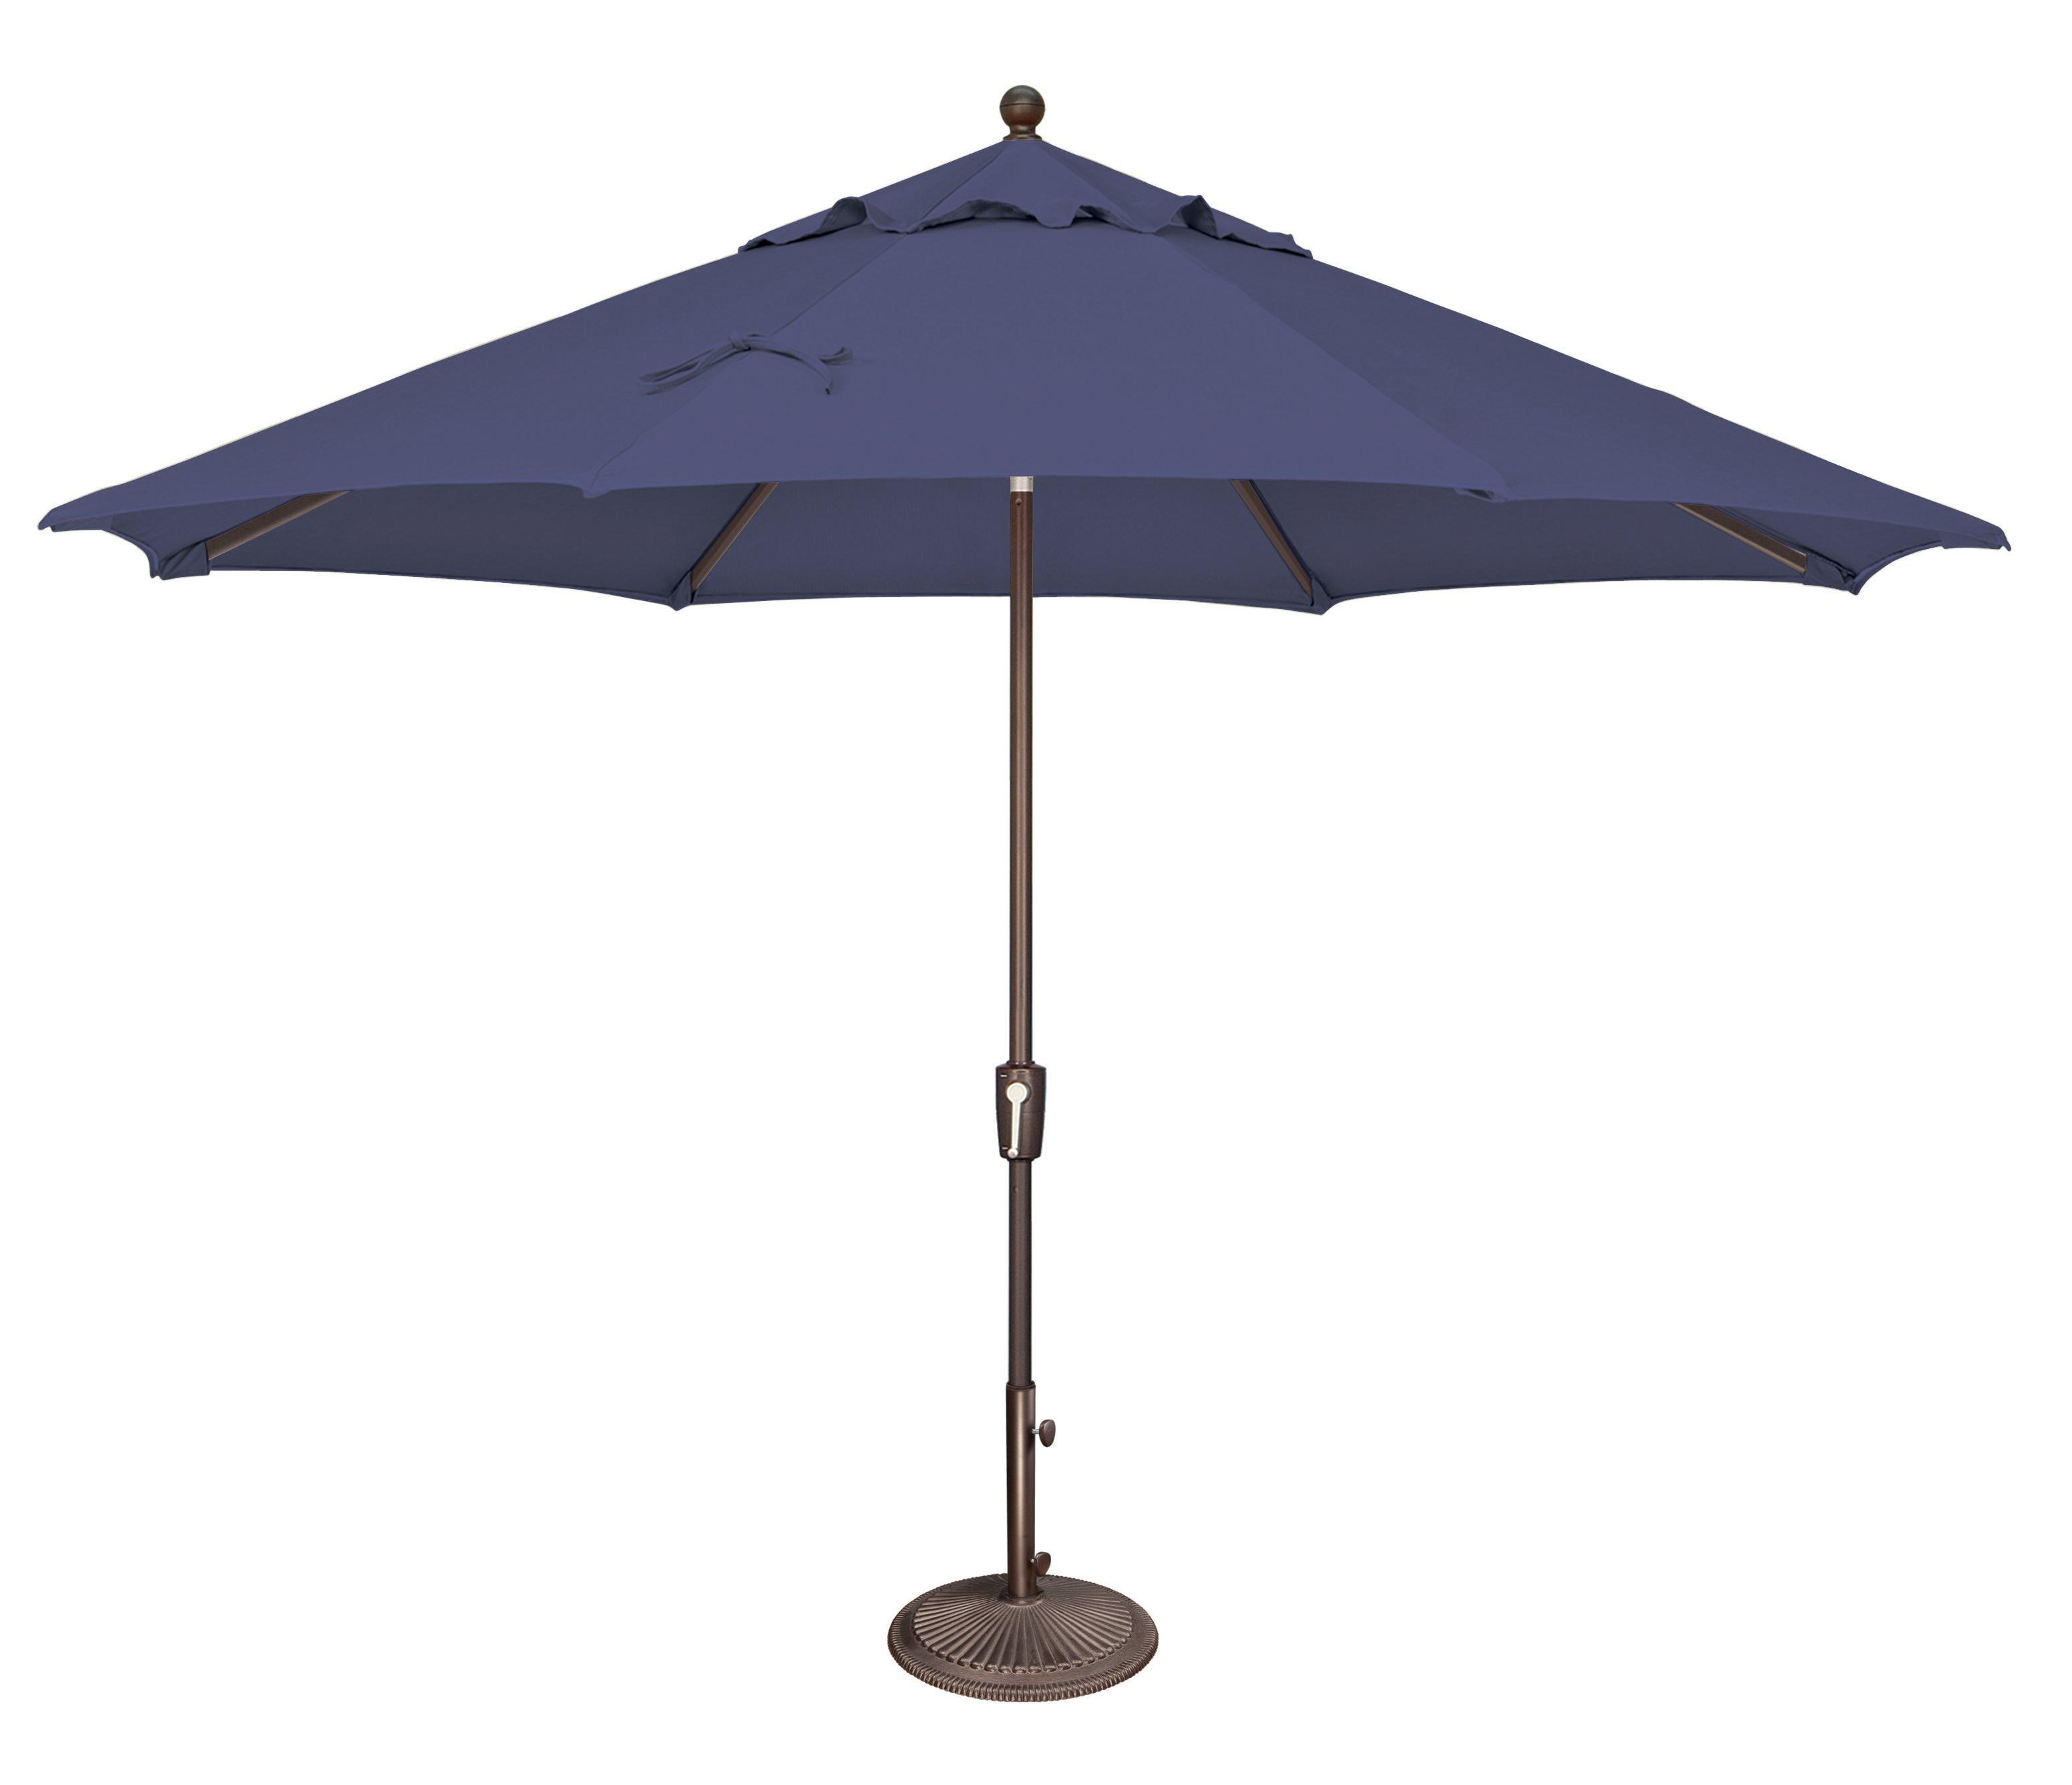 Launceston 11' Market Umbrella With Favorite Keegan Market Umbrellas (View 11 of 20)